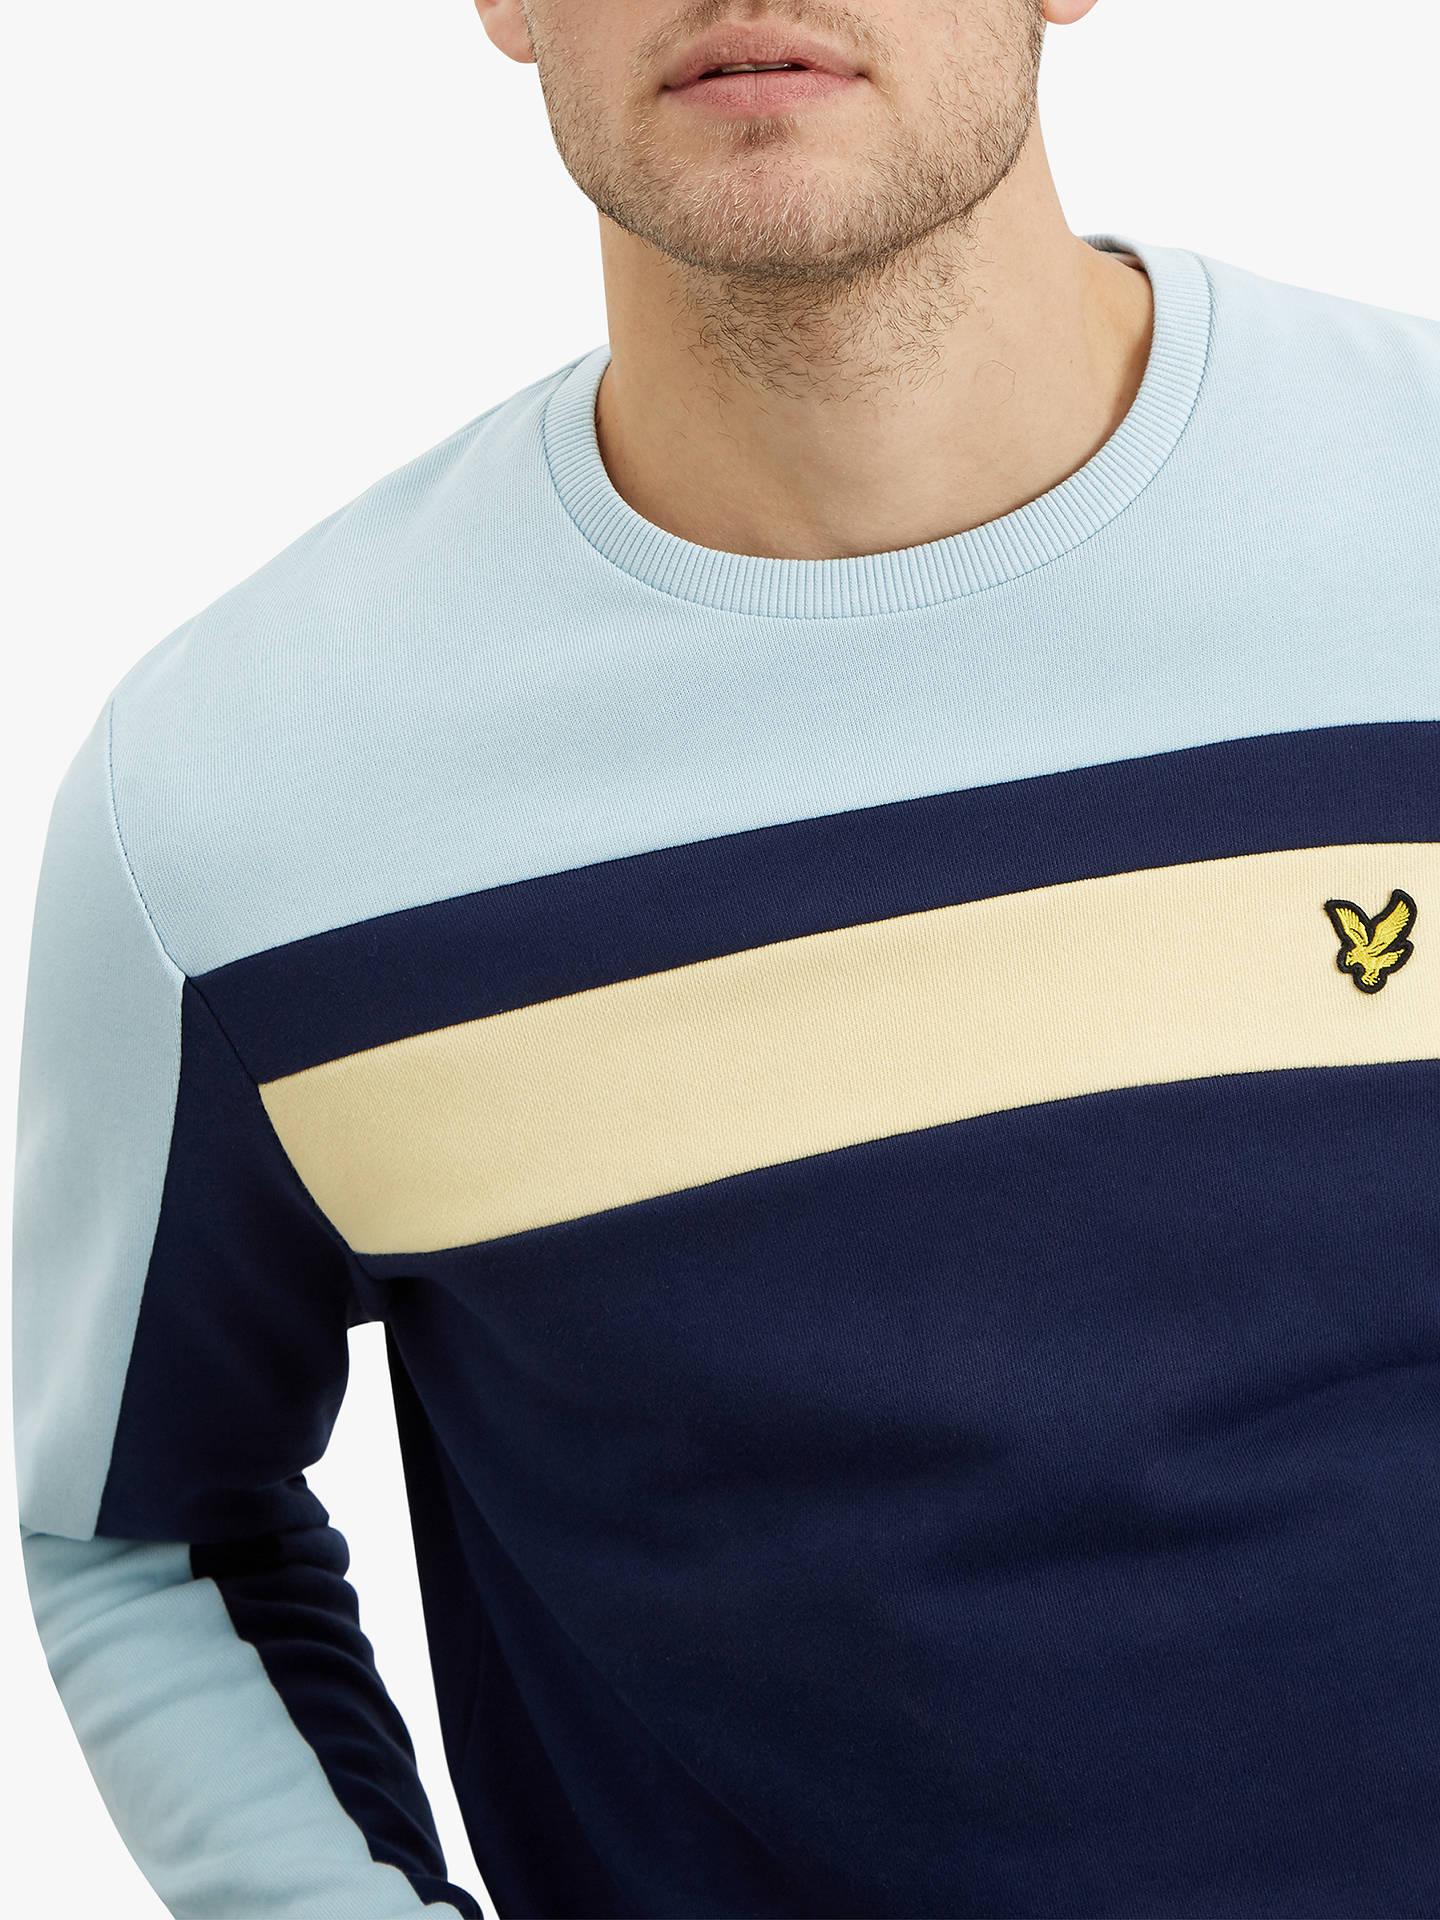 Pop Threads Entitled Millennial Ironic Humor Mens Fleece Crew Sweatshirt